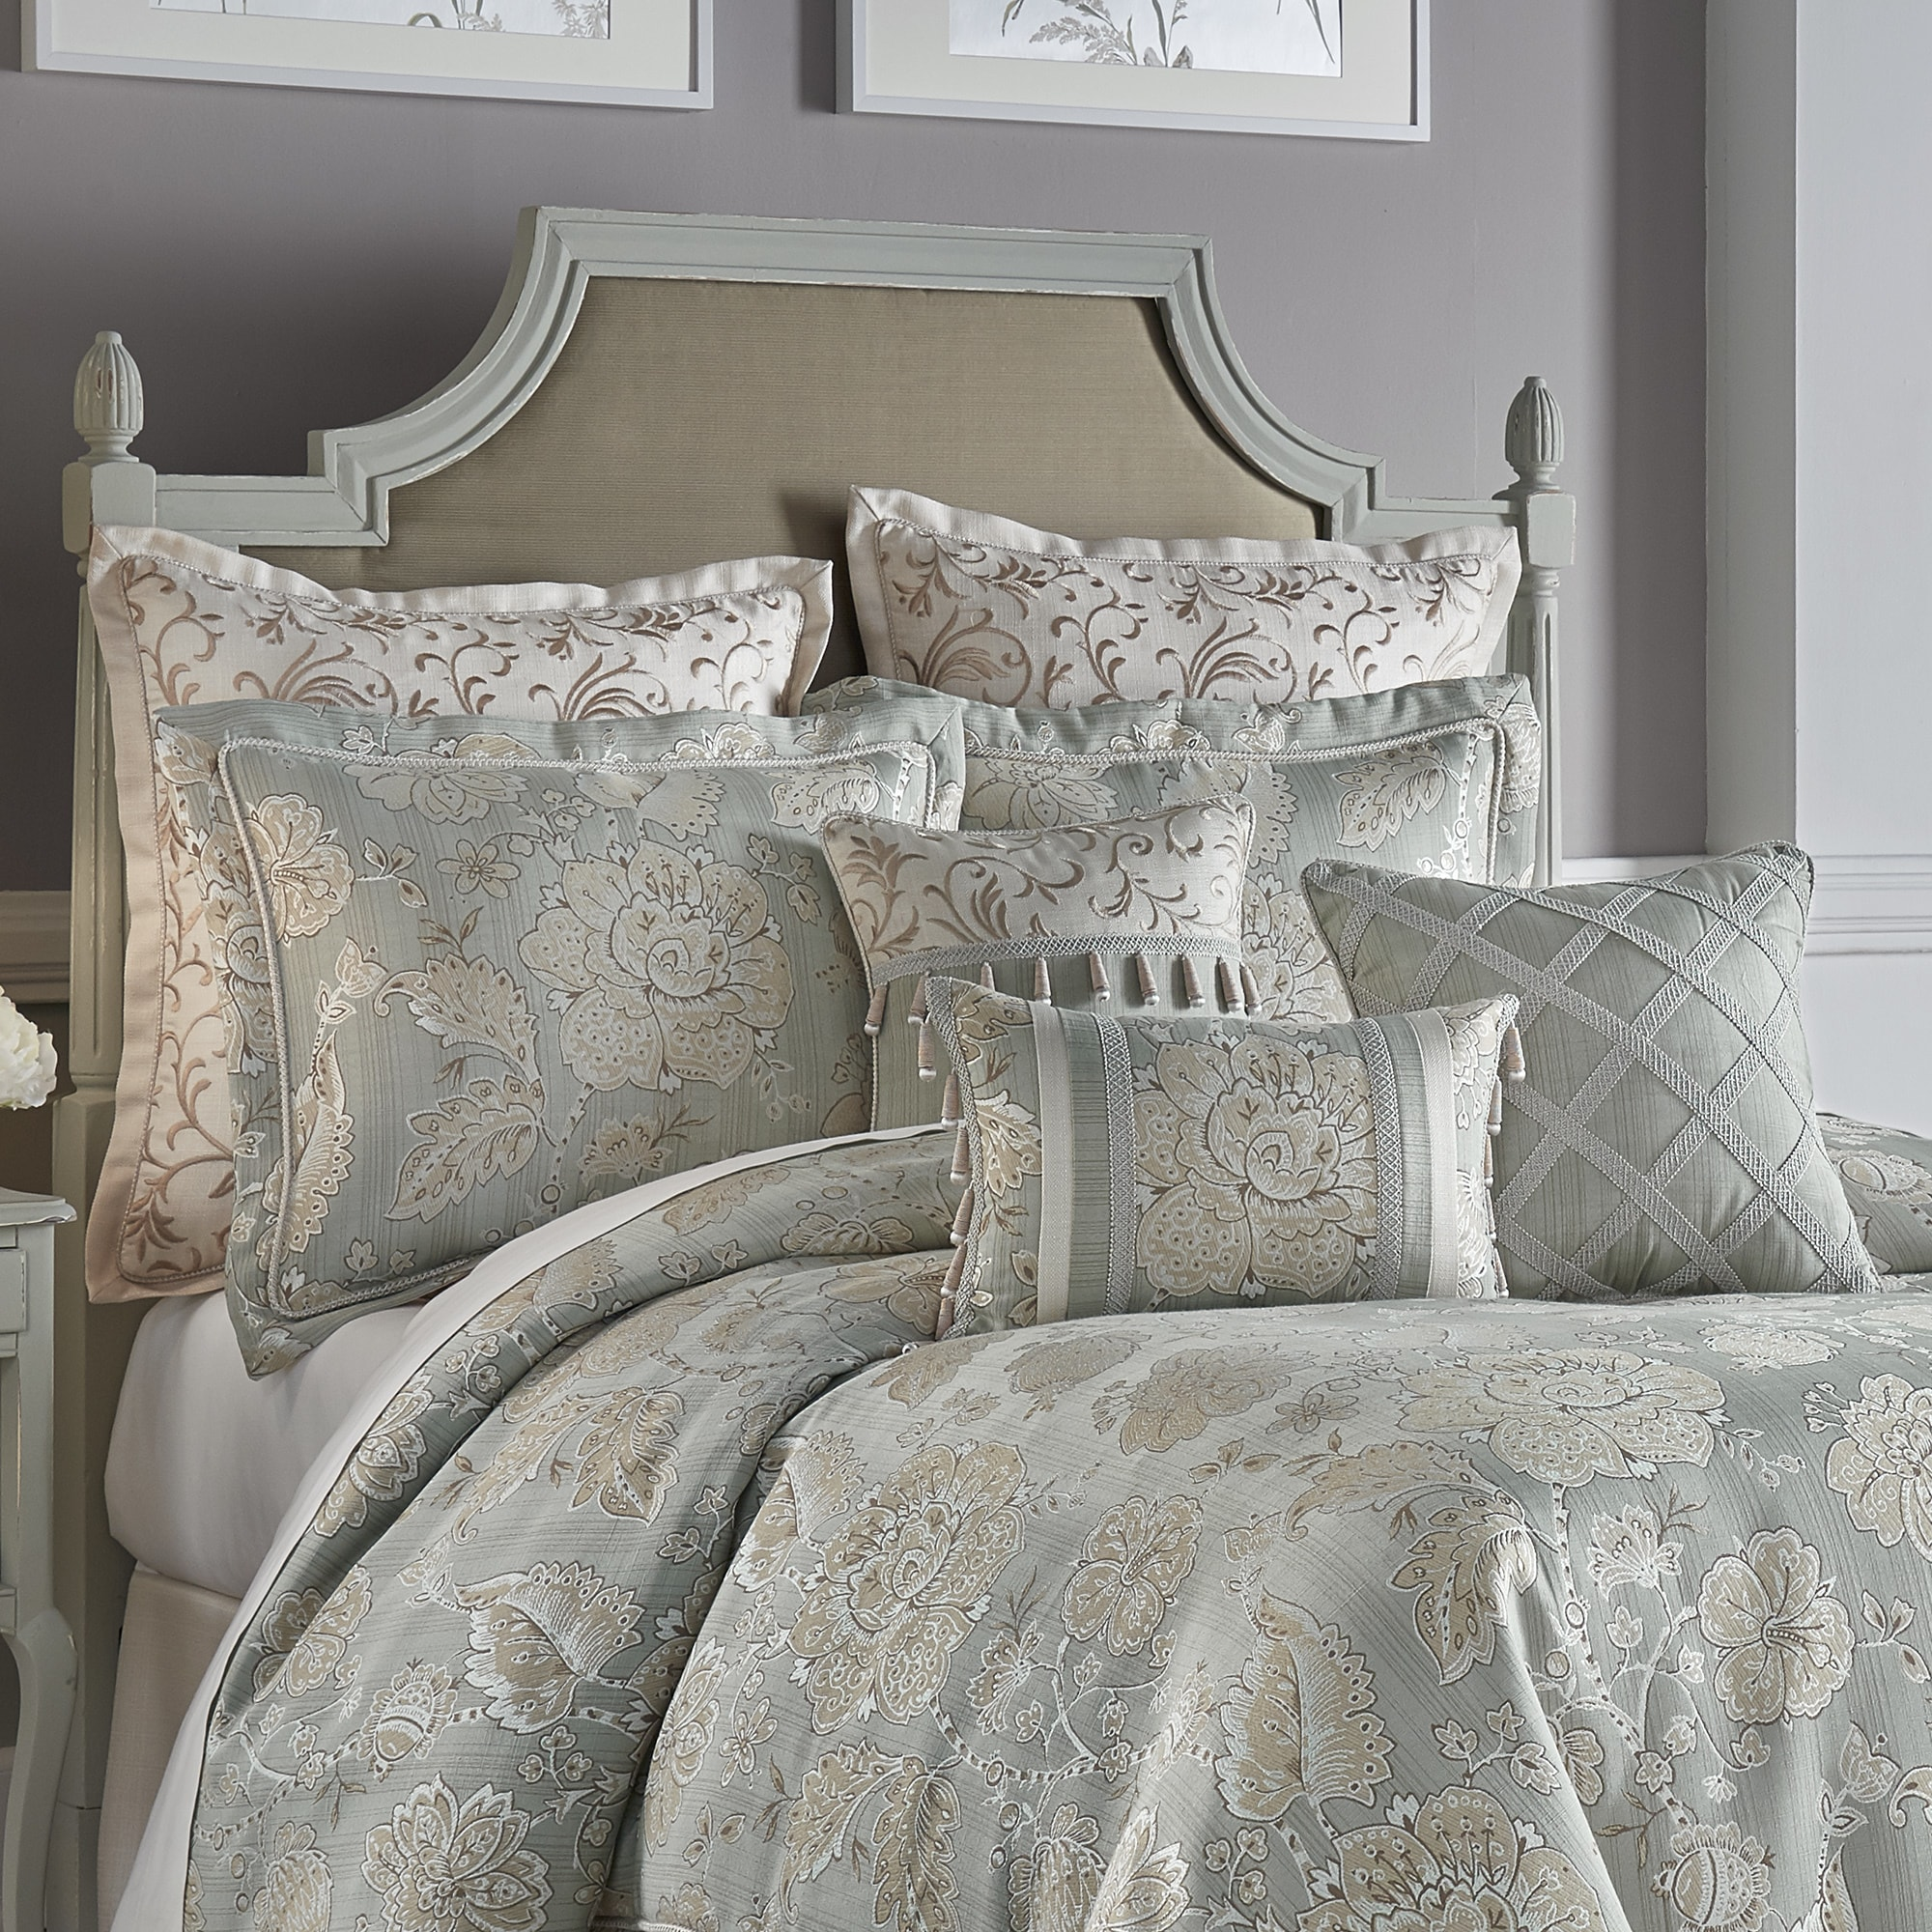 comforter nanshing huntley set linen ebay piece embroidered itm pintuck